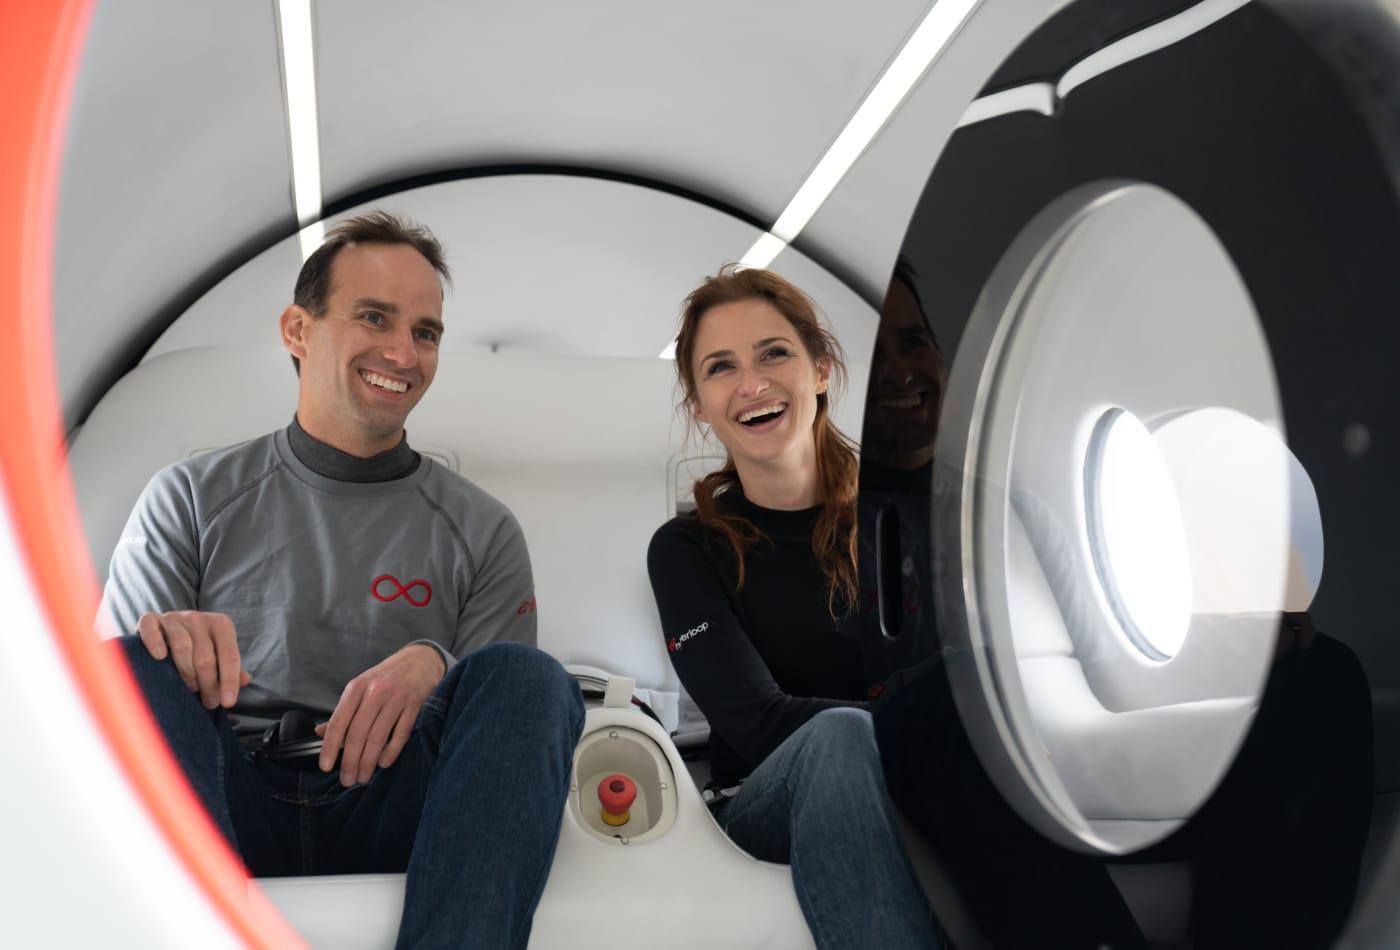 Virgin Hyperloop tests first passenger journey in Nevada